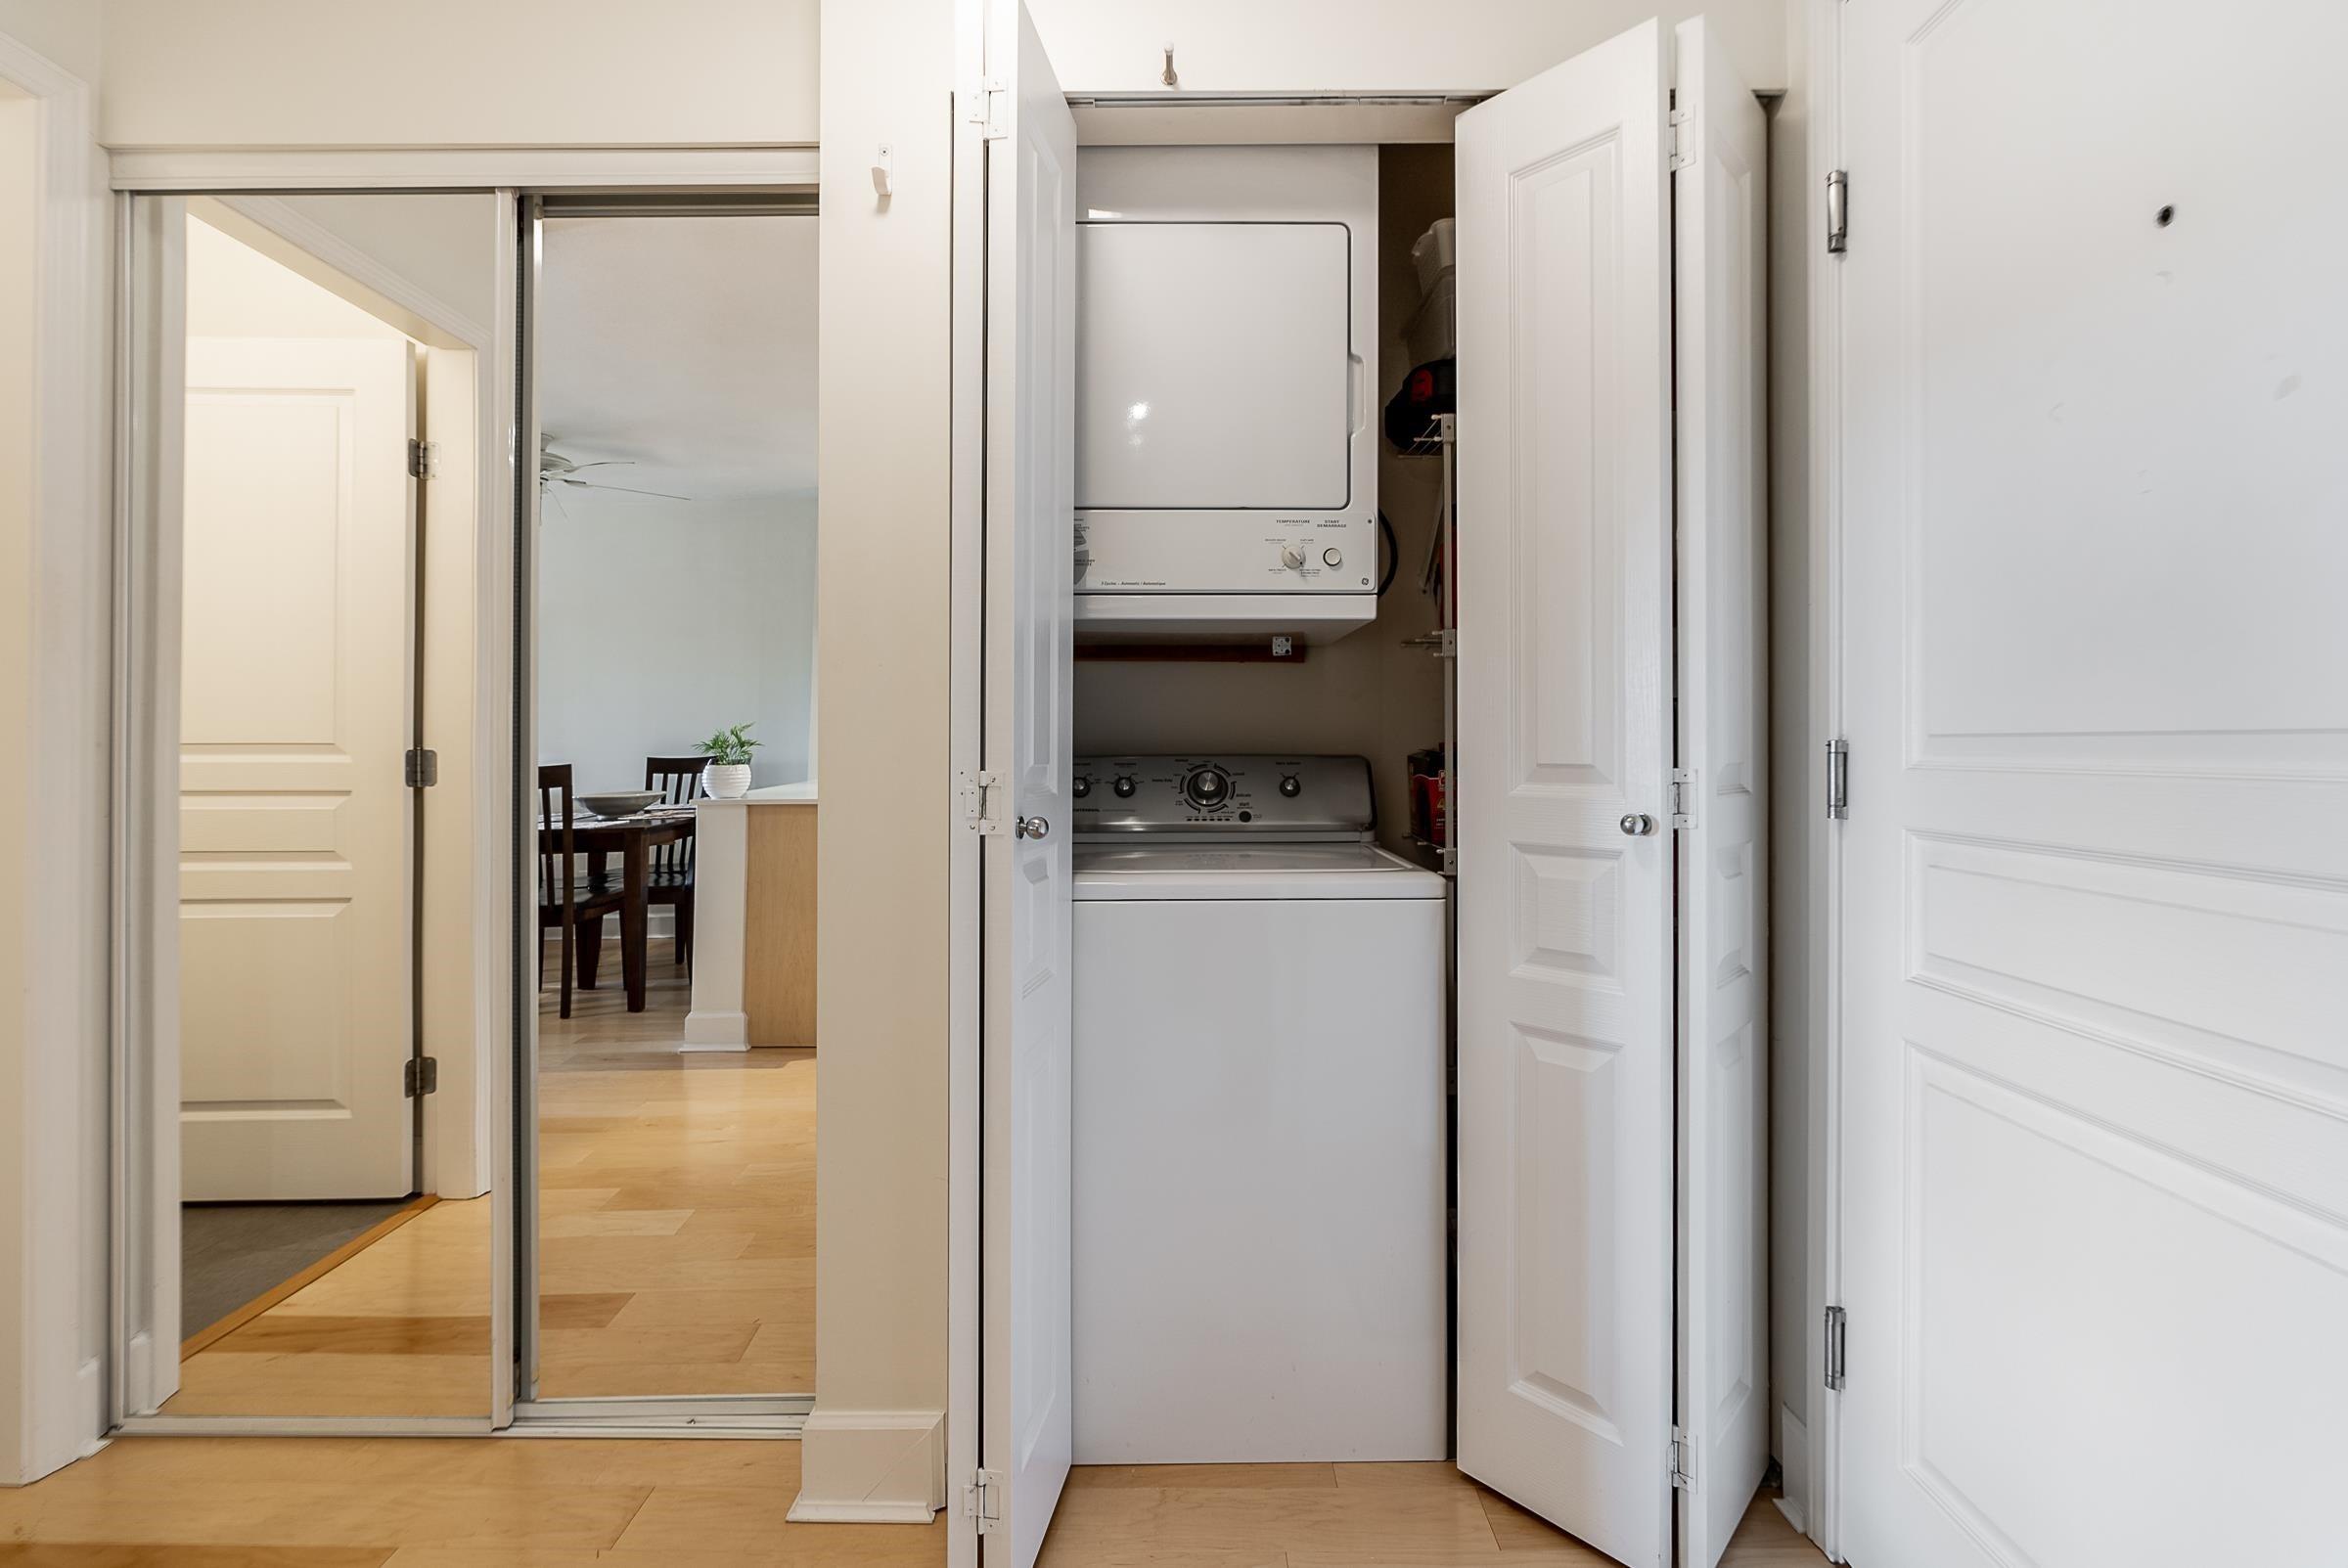 406 1989 DUNBAR STREET - Kitsilano Apartment/Condo for sale, 1 Bedroom (R2624949) - #15